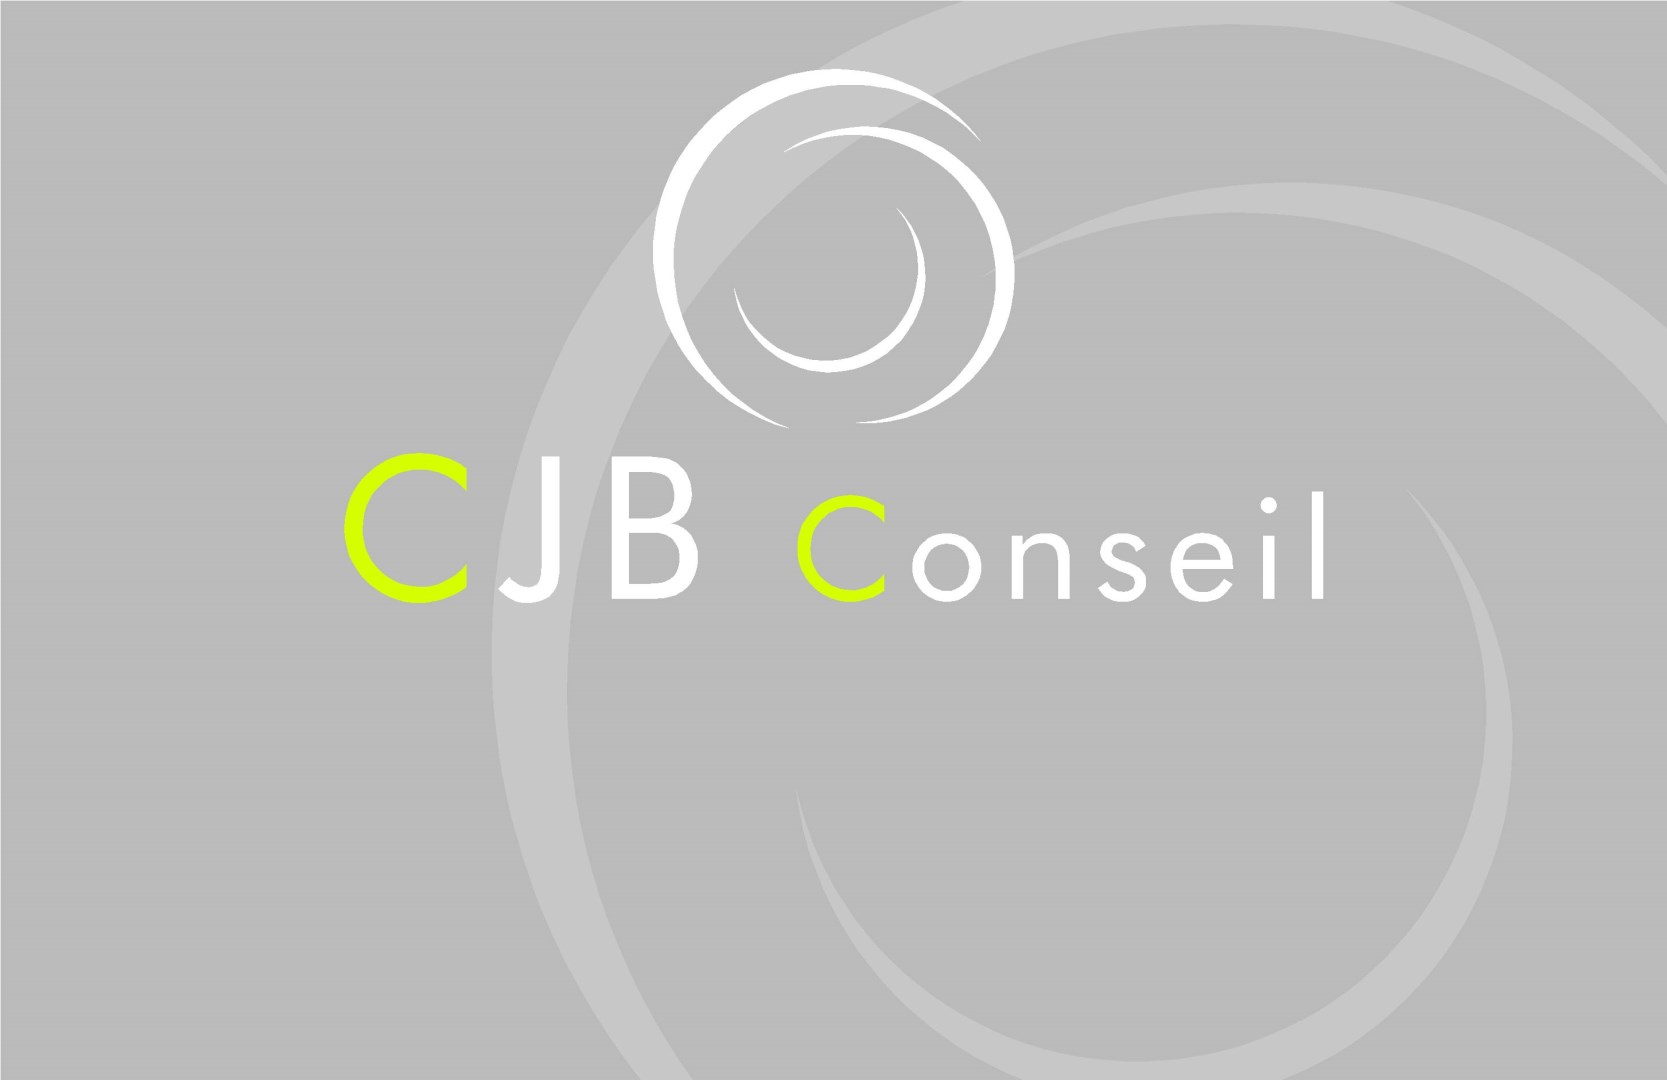 C.J.B CONSEIL